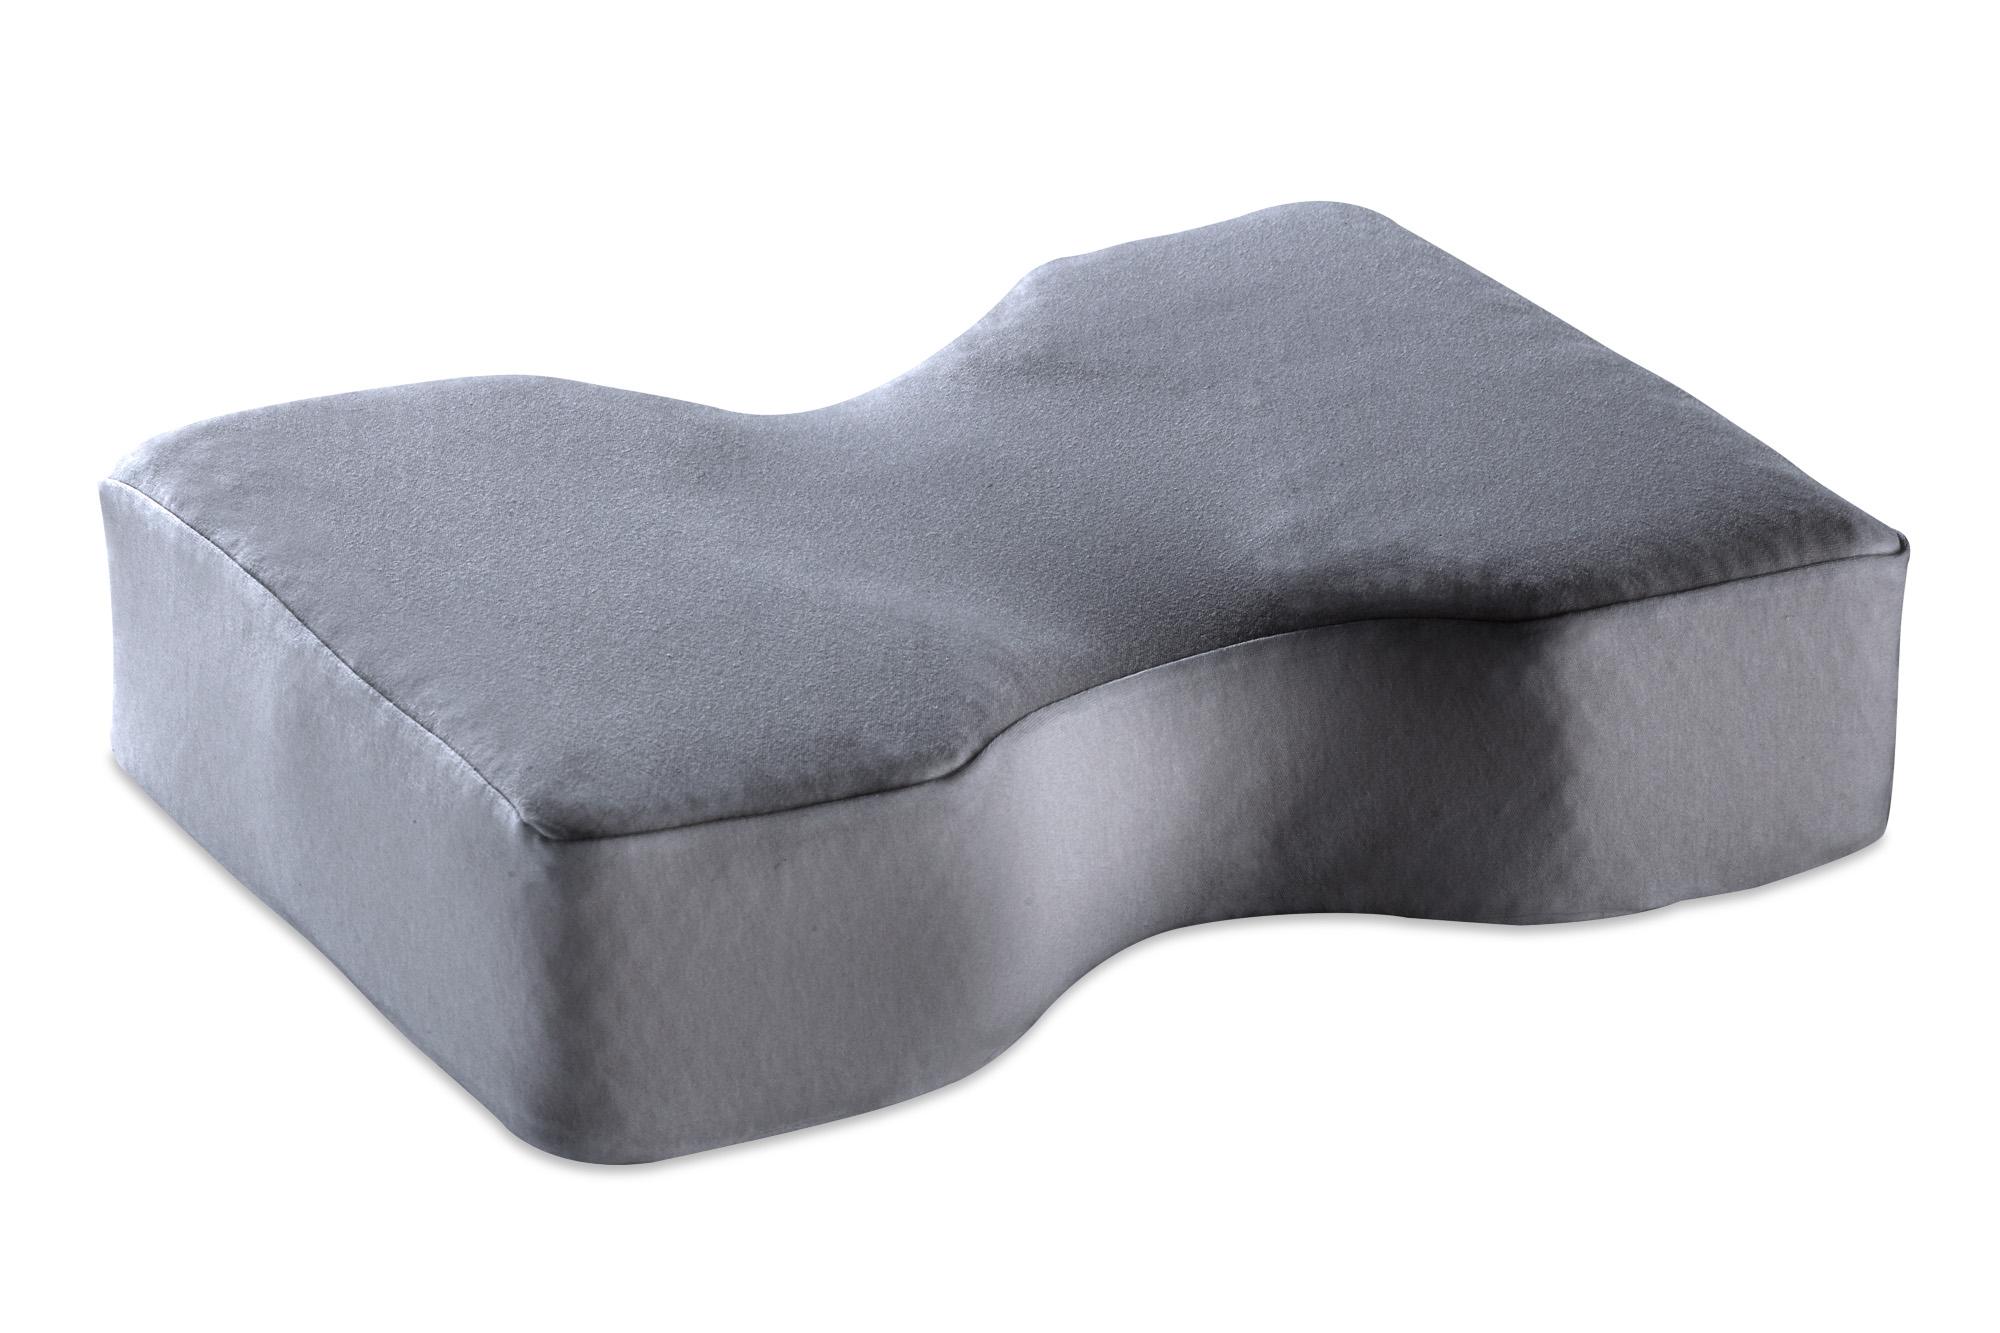 Sanapur Kopfkissenbezug Grau 100% Baumwolle